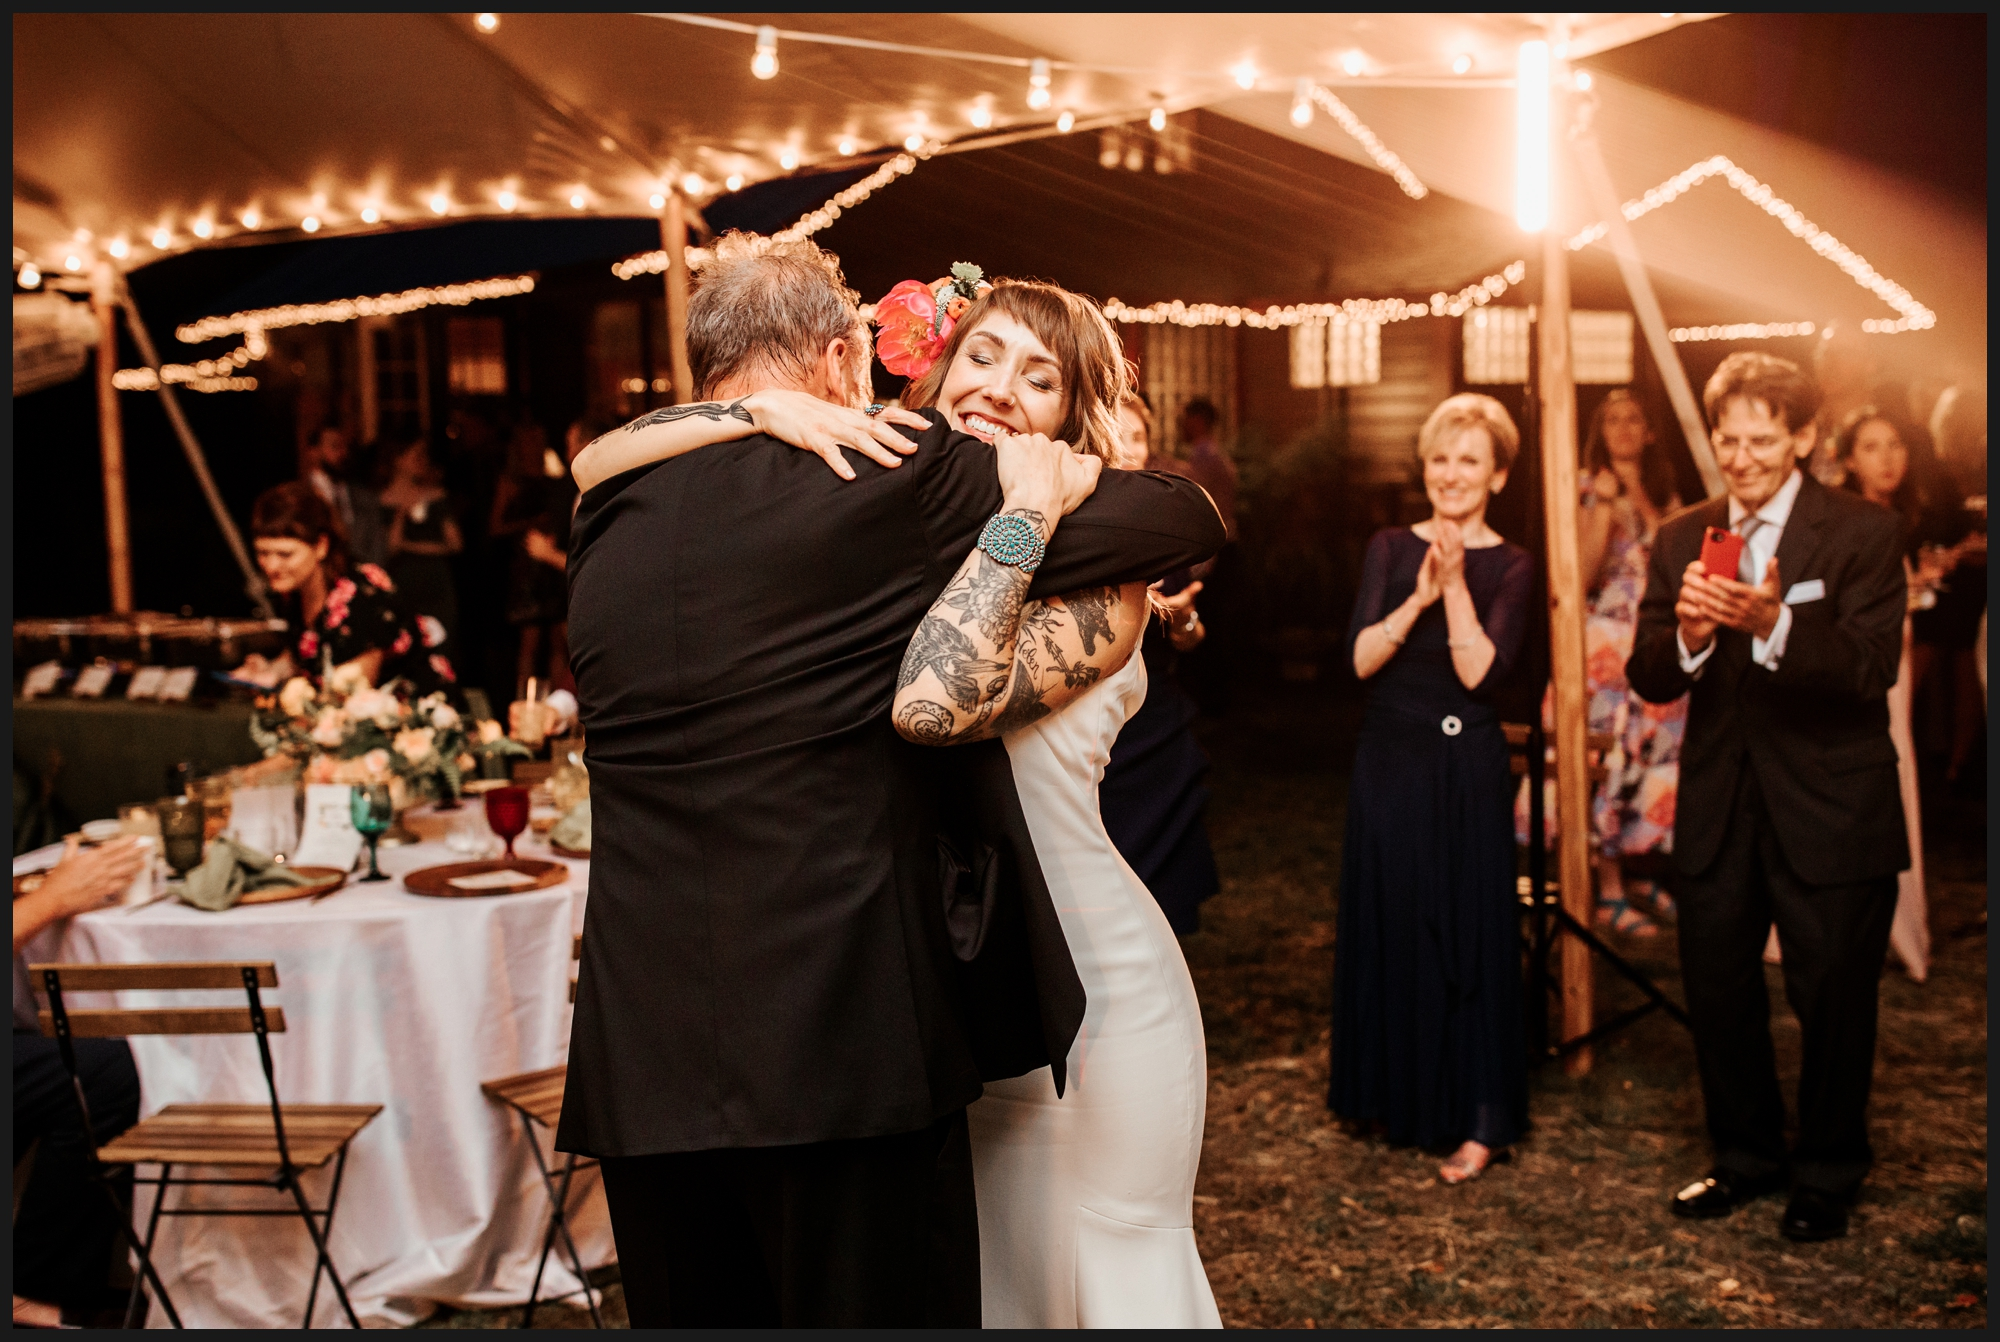 Orlando-Wedding-Photographer-destination-wedding-photographer-florida-wedding-photographer-bohemian-wedding-photographer_2047.jpg